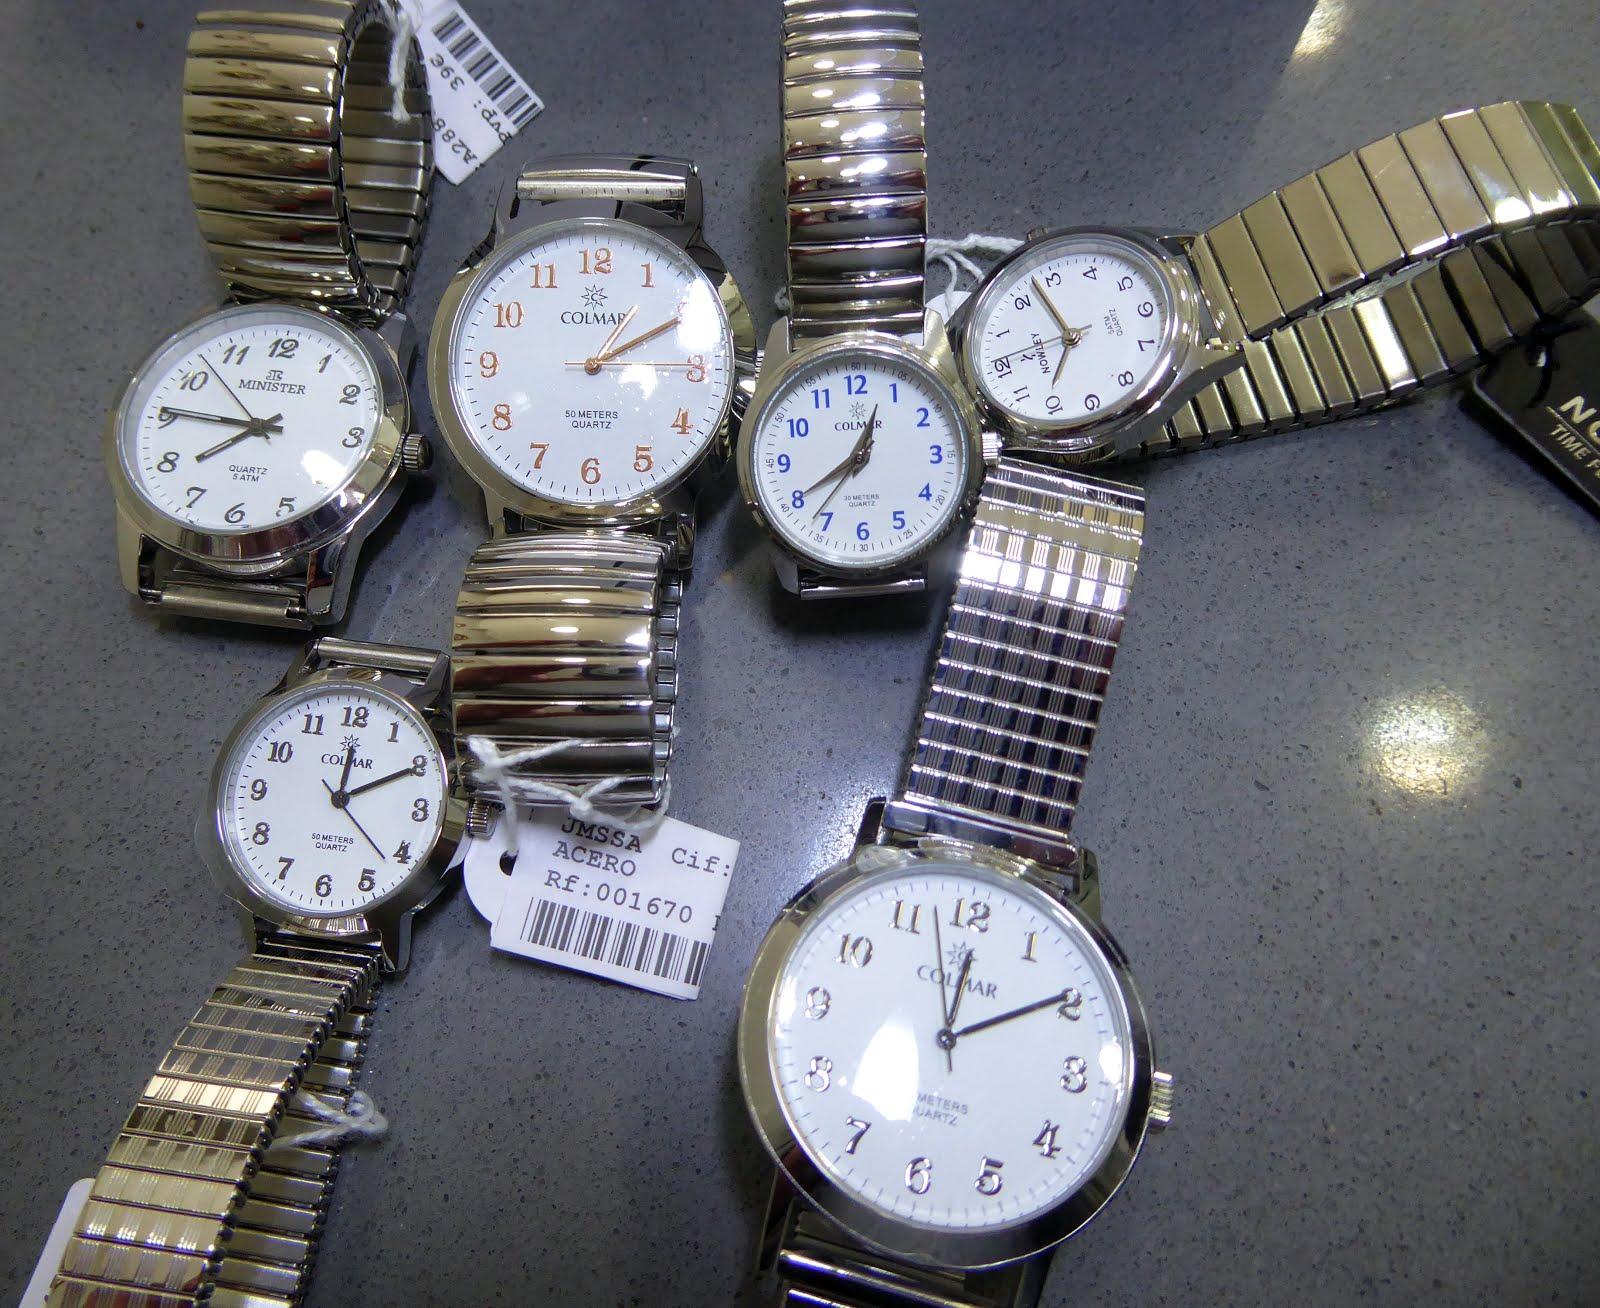 Relojes con pulsera extensible